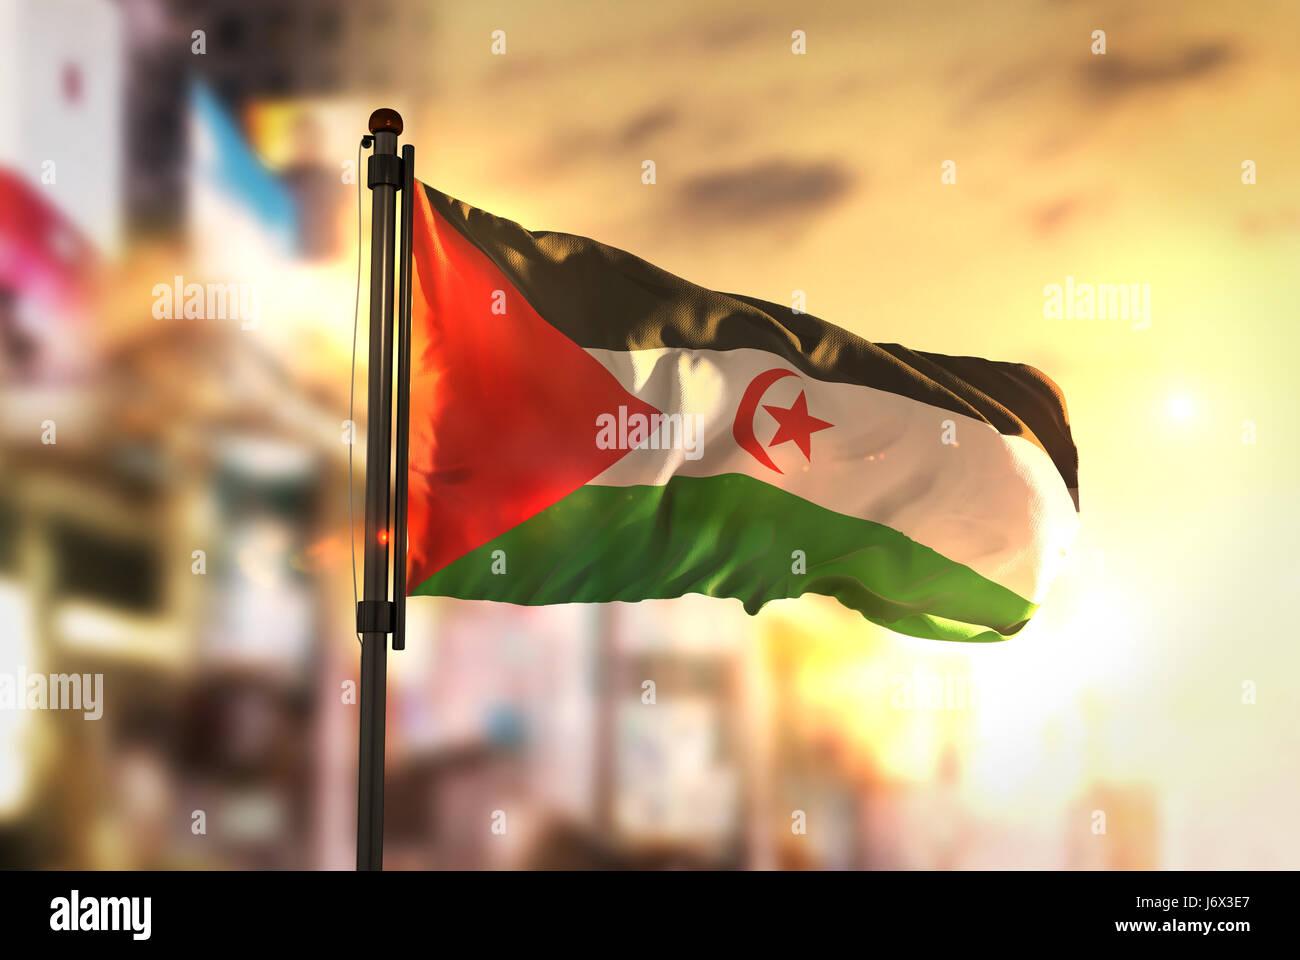 Sahrawi Flag Against City Blurred Background At Sunrise Backlight - Stock Image